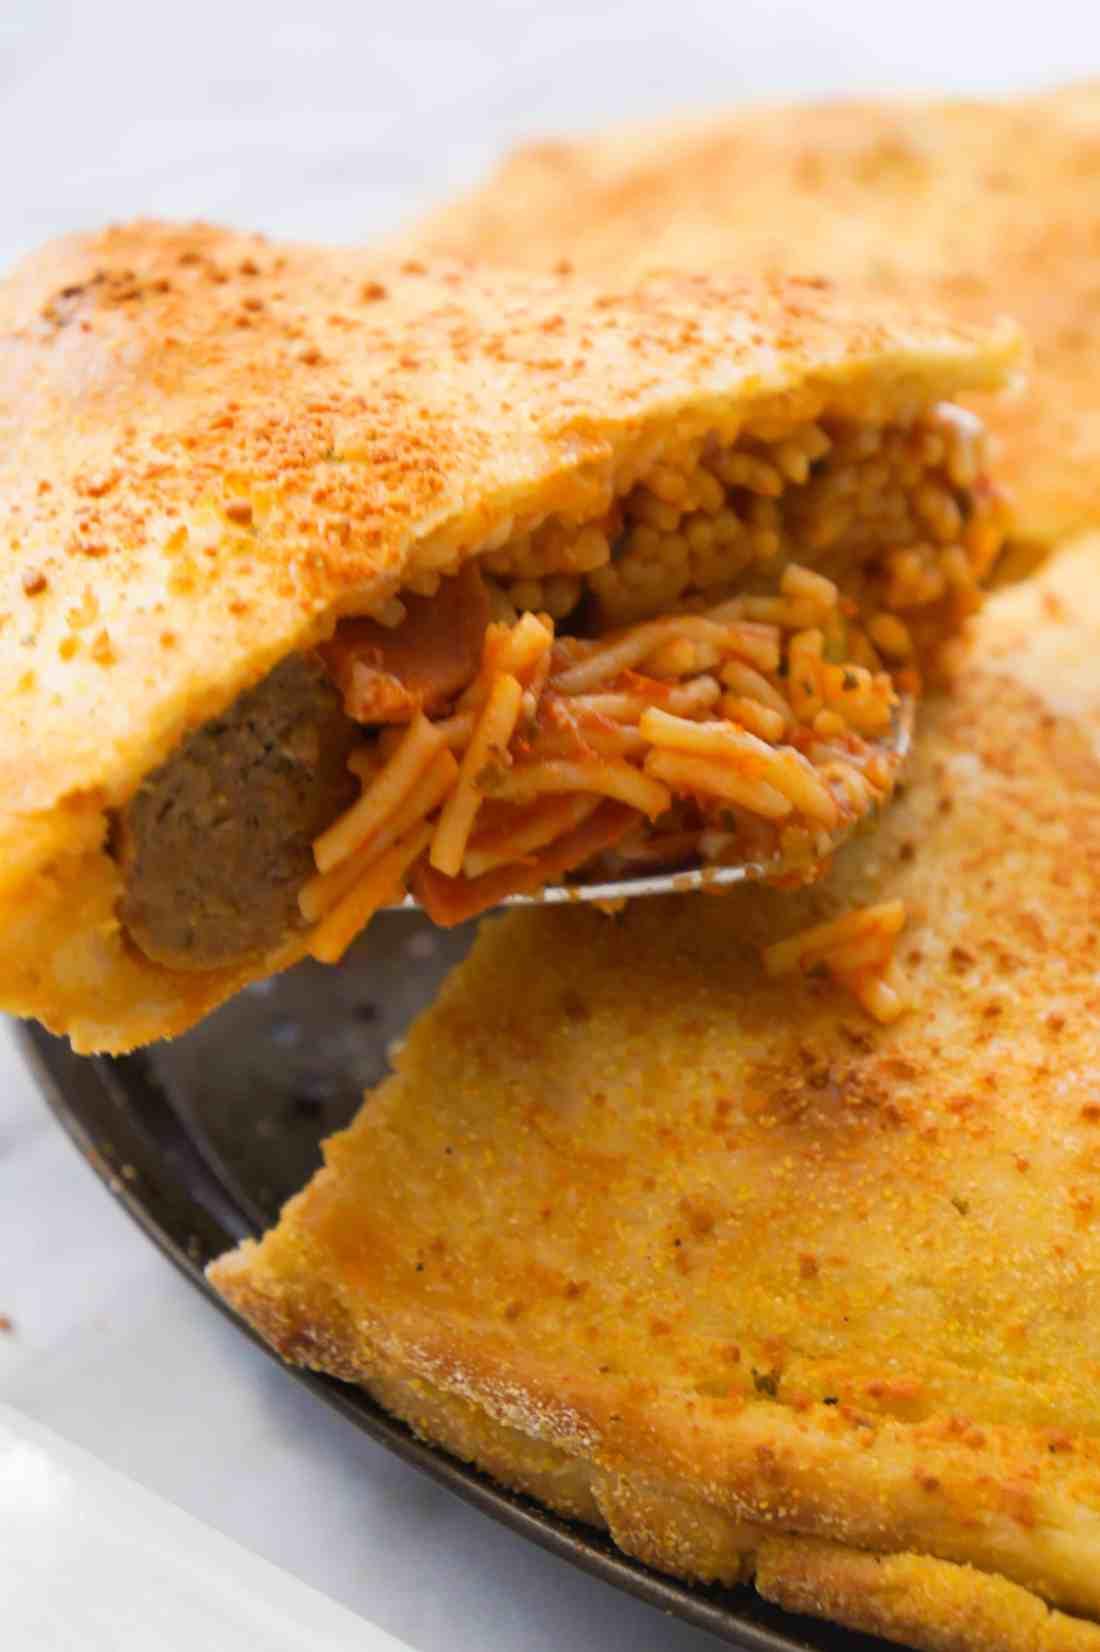 Slice of spaghetti and meatballs stuffed pizza